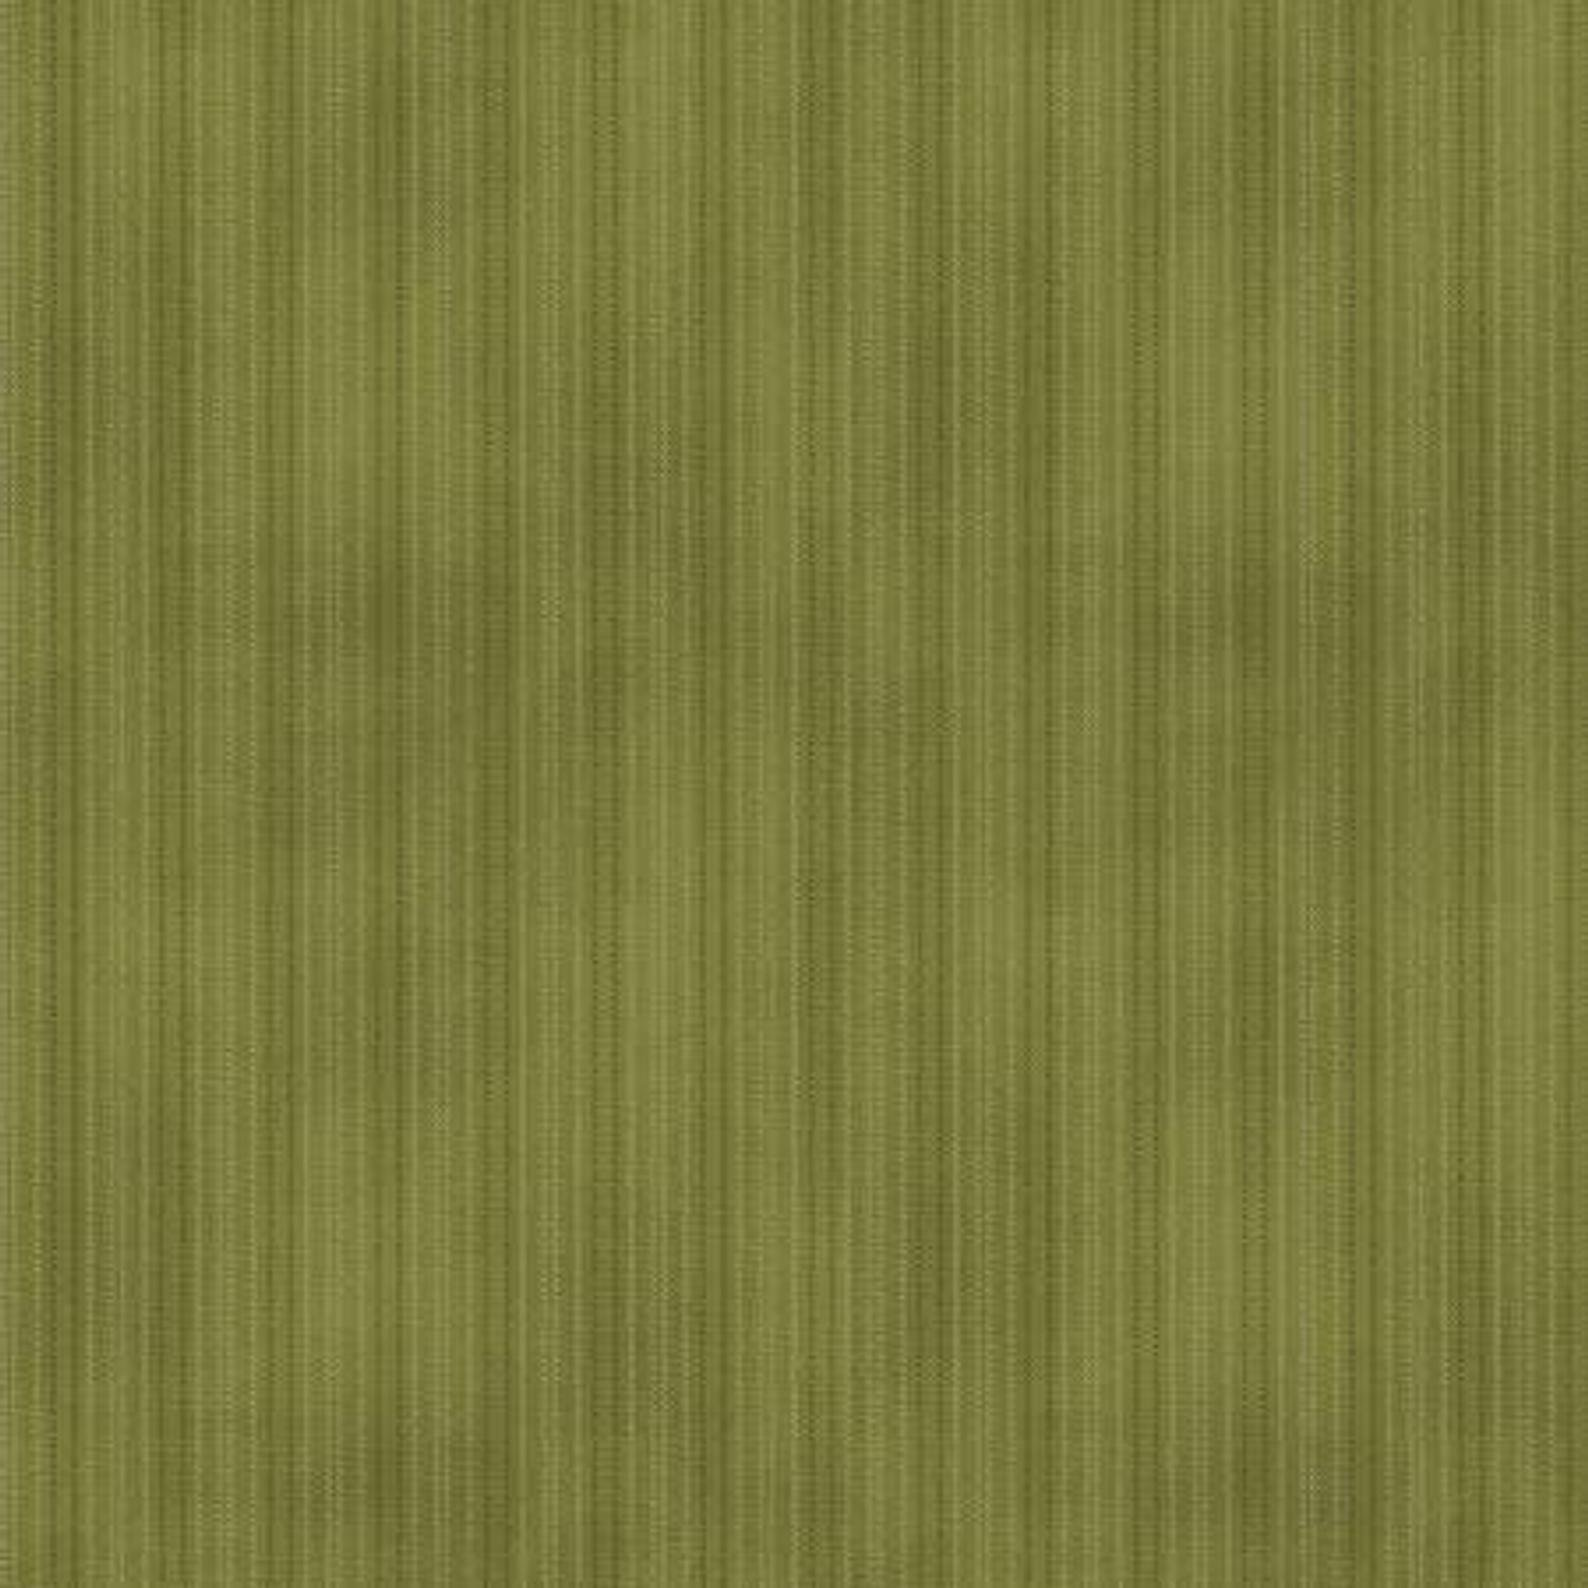 Another Moose Is Loose - 9616 44  Wool Look Stripe Green by Benartex